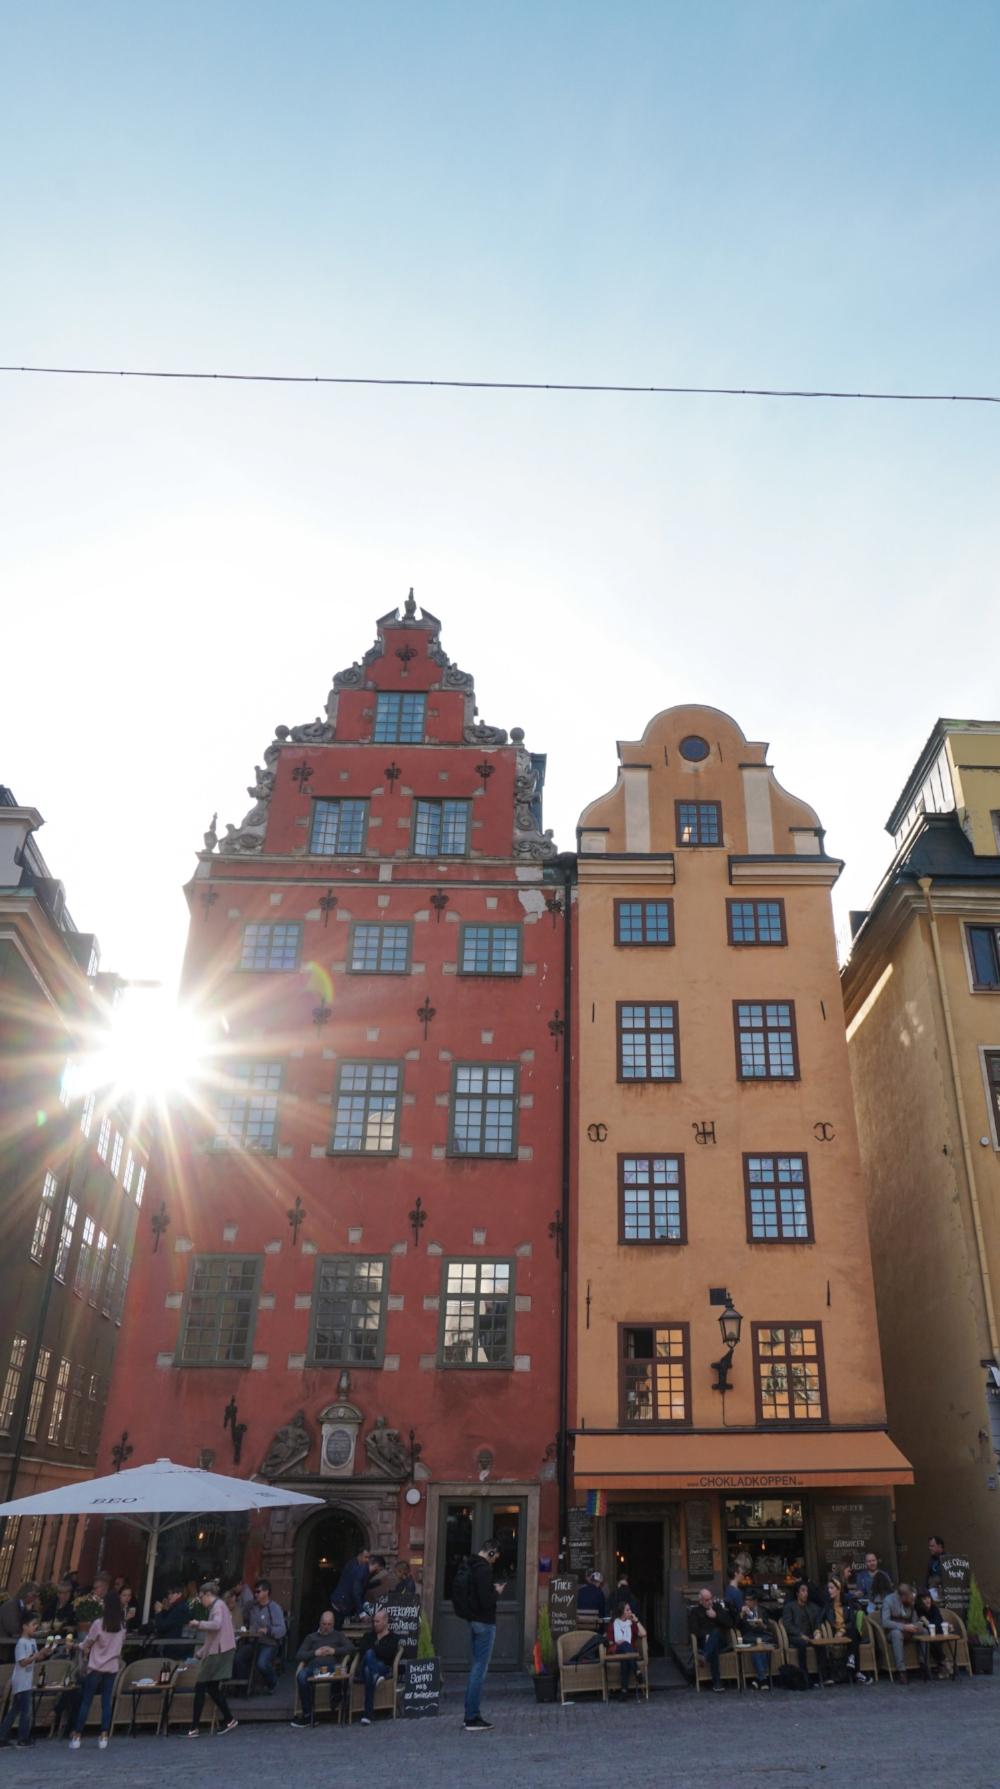 curio.trips.sweden.stockholm.gamla.stan.cropped.jpg